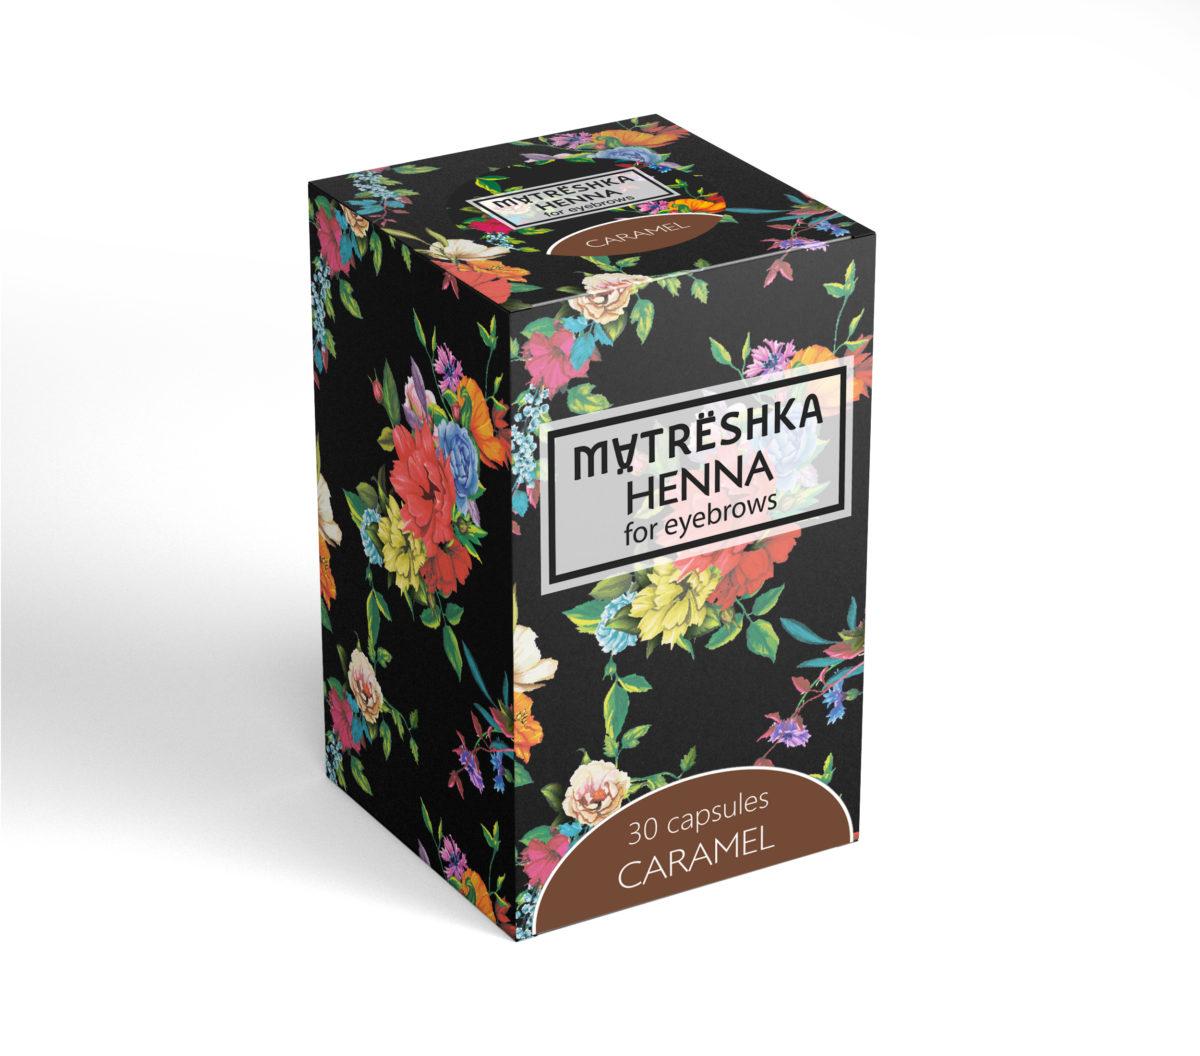 Matreshka Henna CARAMEL 30 kapsułek Henna pudrowa